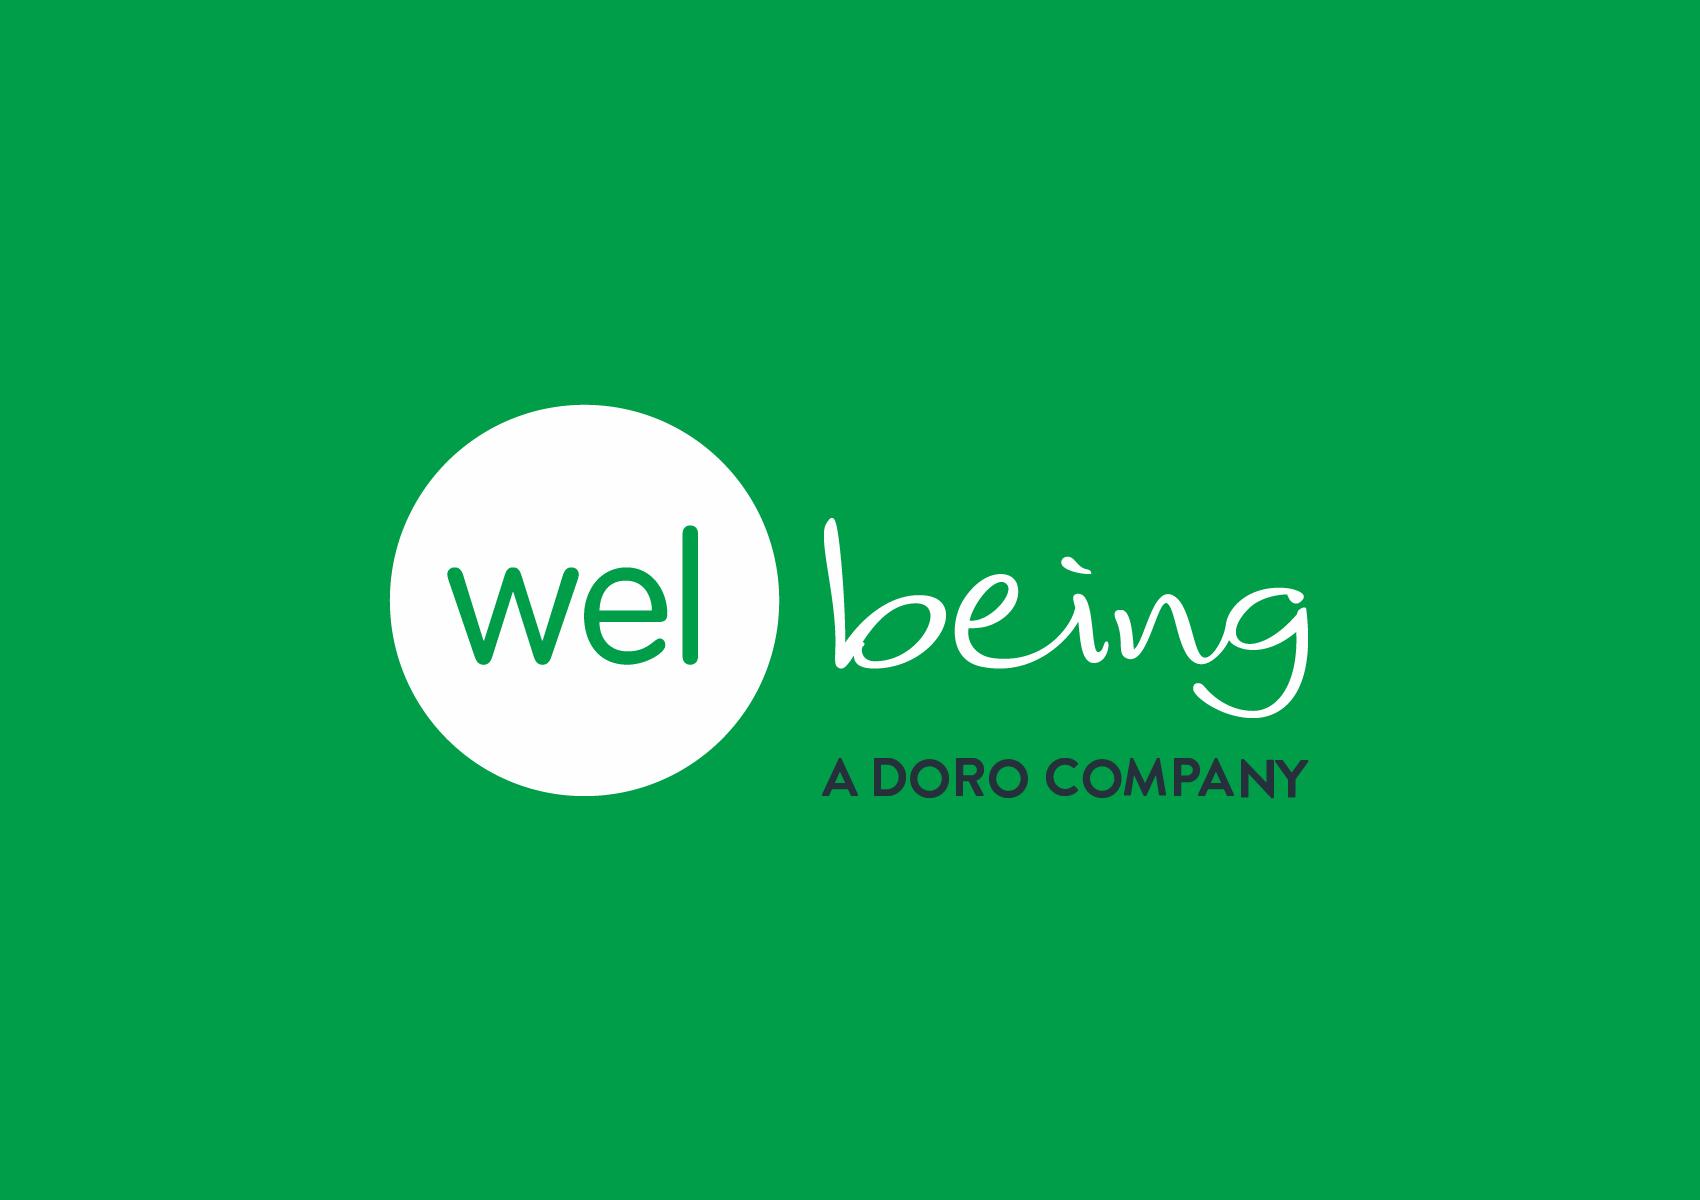 Welbeing brand identity